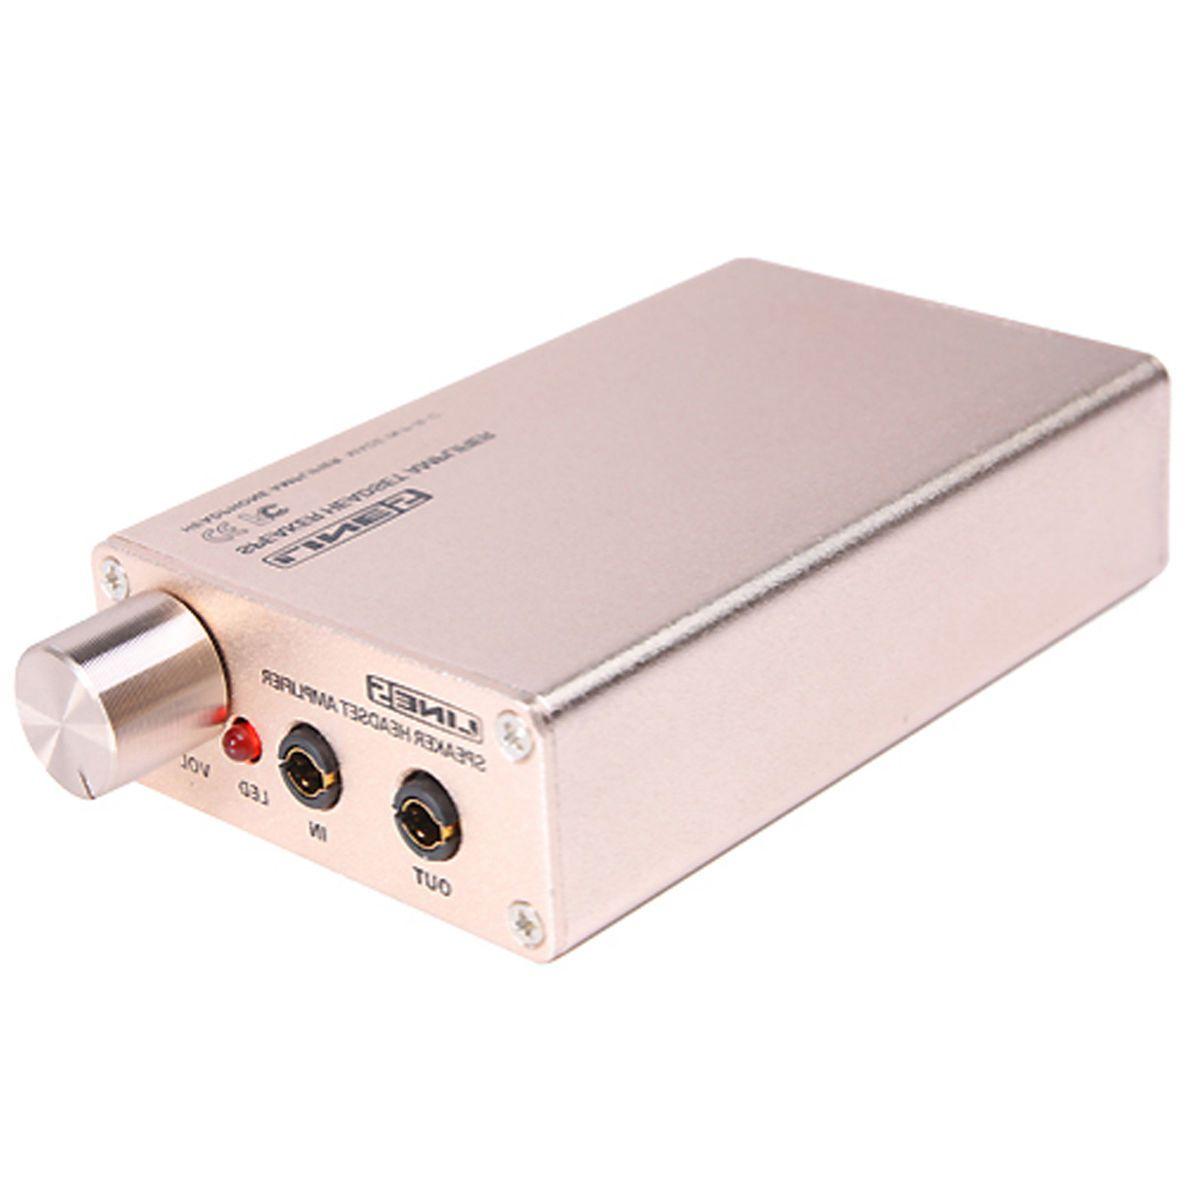 New Arrival High Quality Mini MP3 USB Digital Player FM Radio Remote Control LED Headphone Car Amplifier | #HeadphonesAmplifier